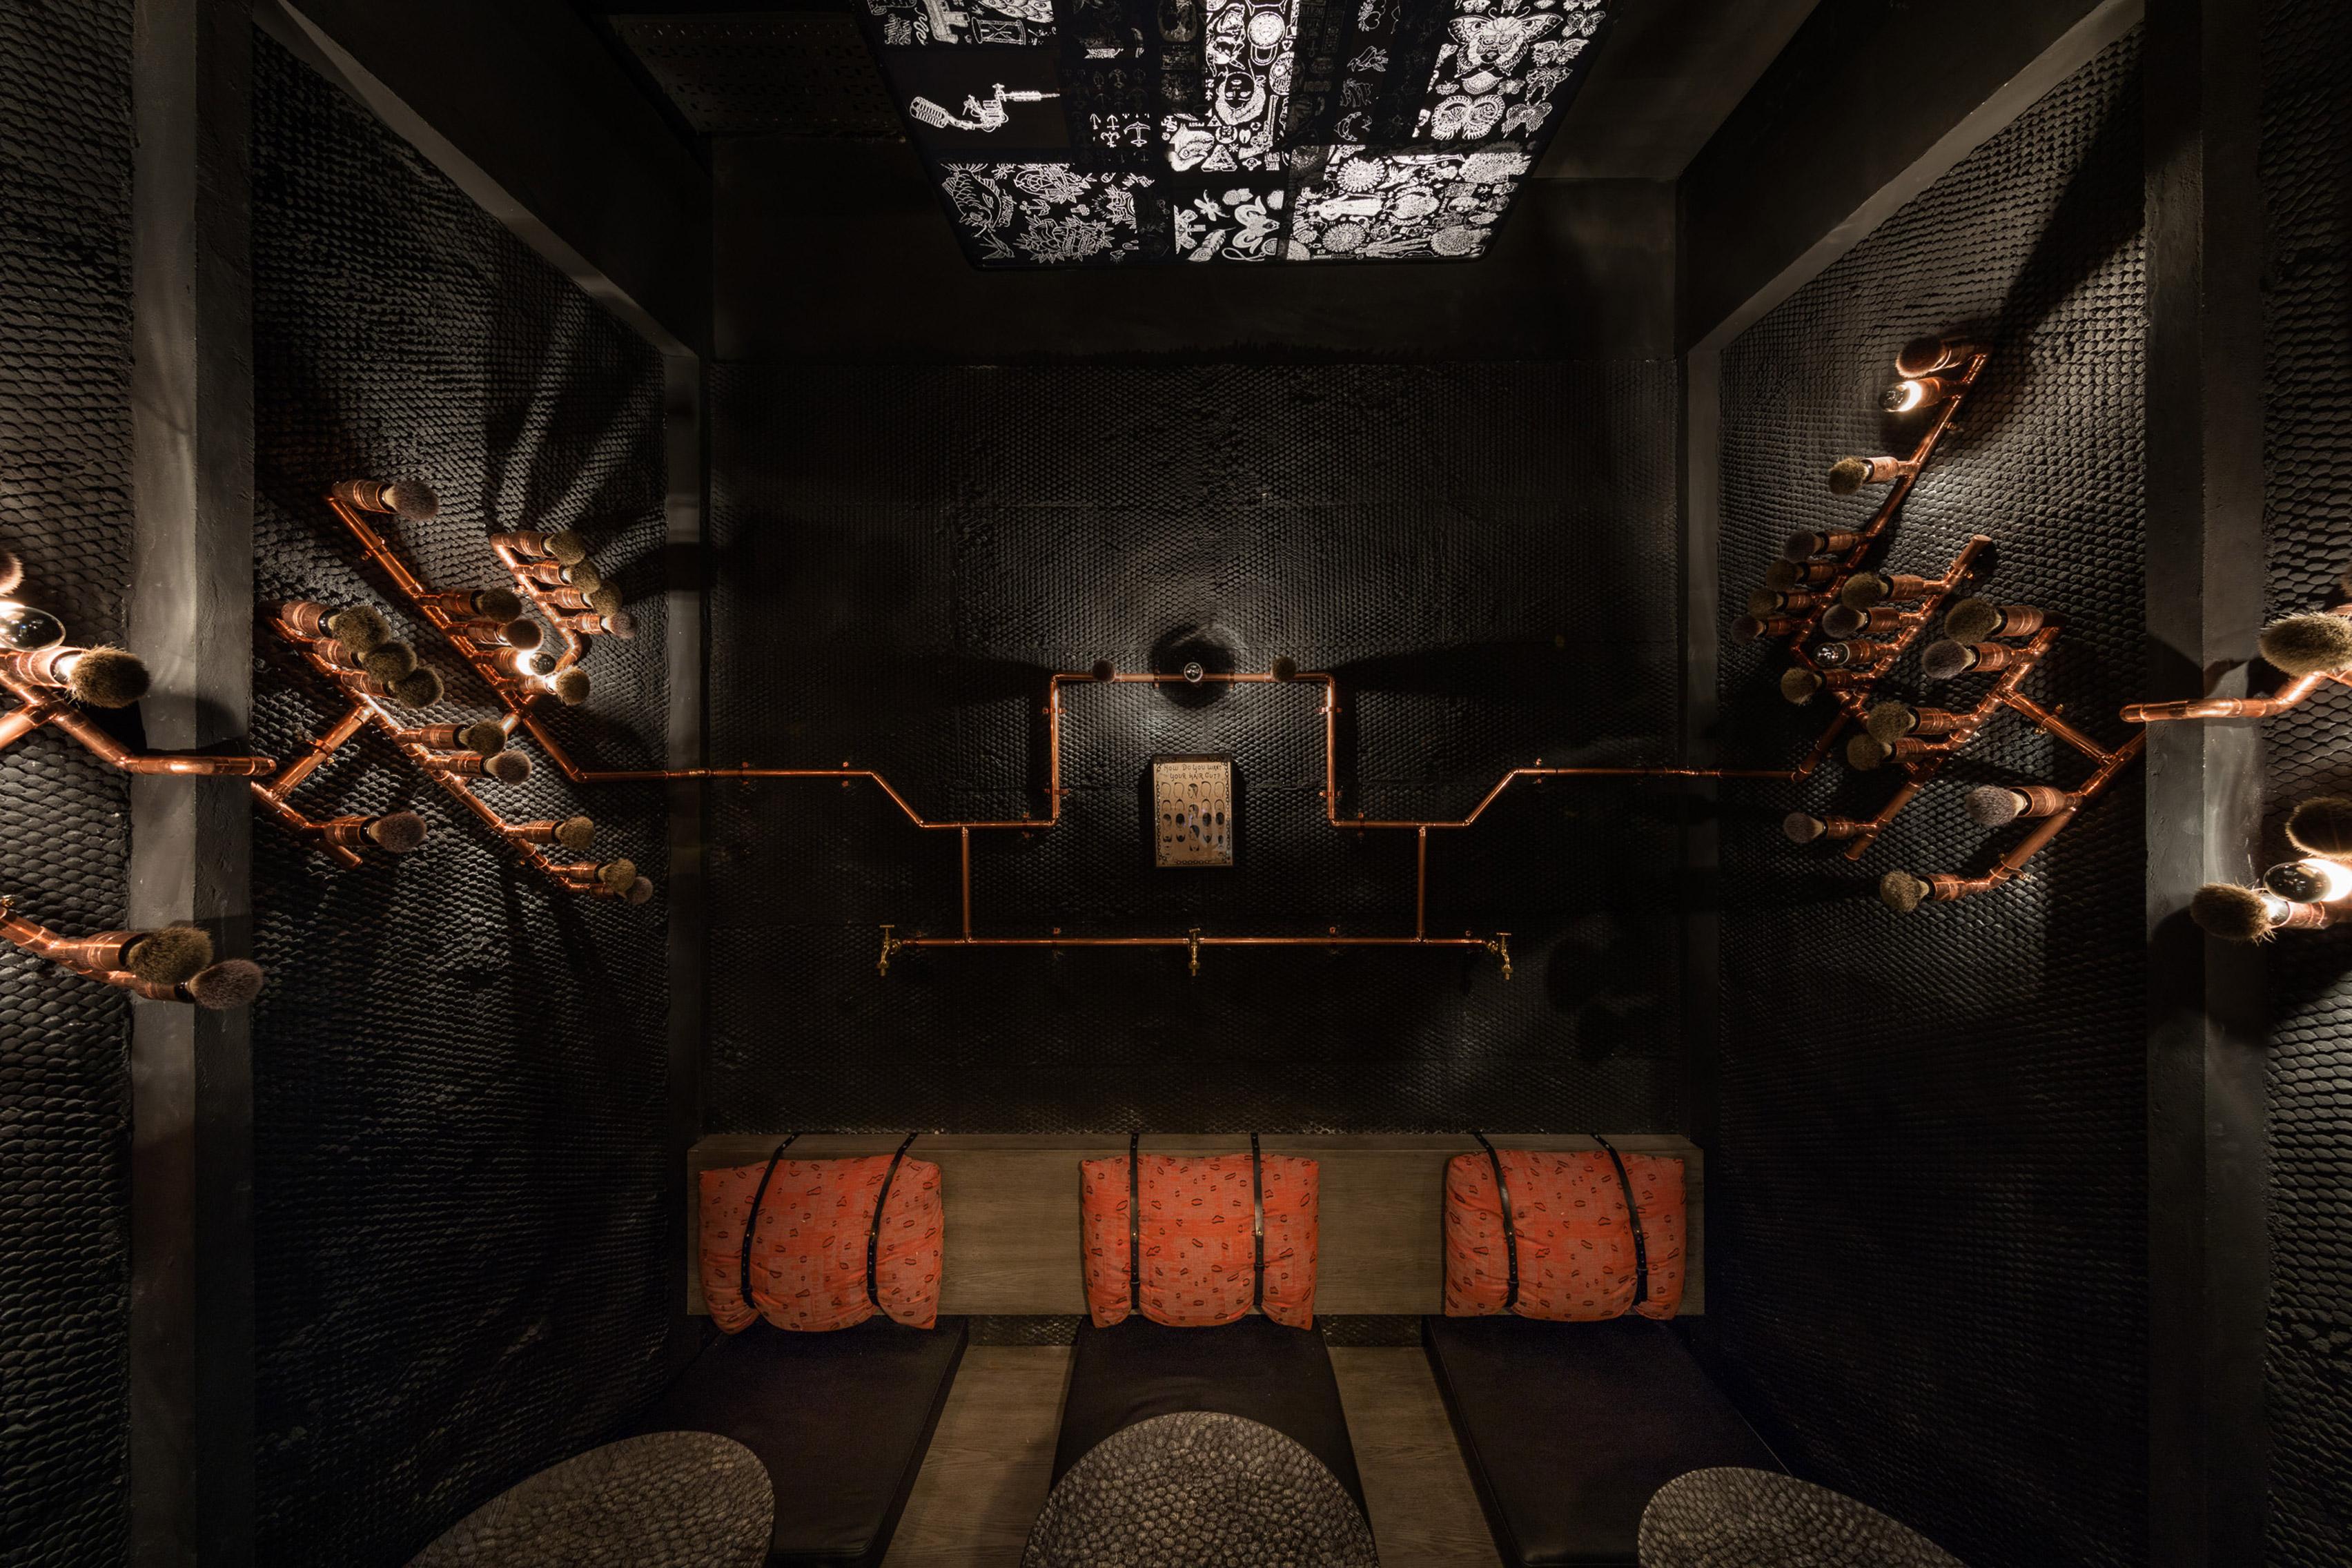 dennis-lo-rhoda-restaurant-joyce-wang-studio-hong-kong-interior-design_dezeen_3408_4